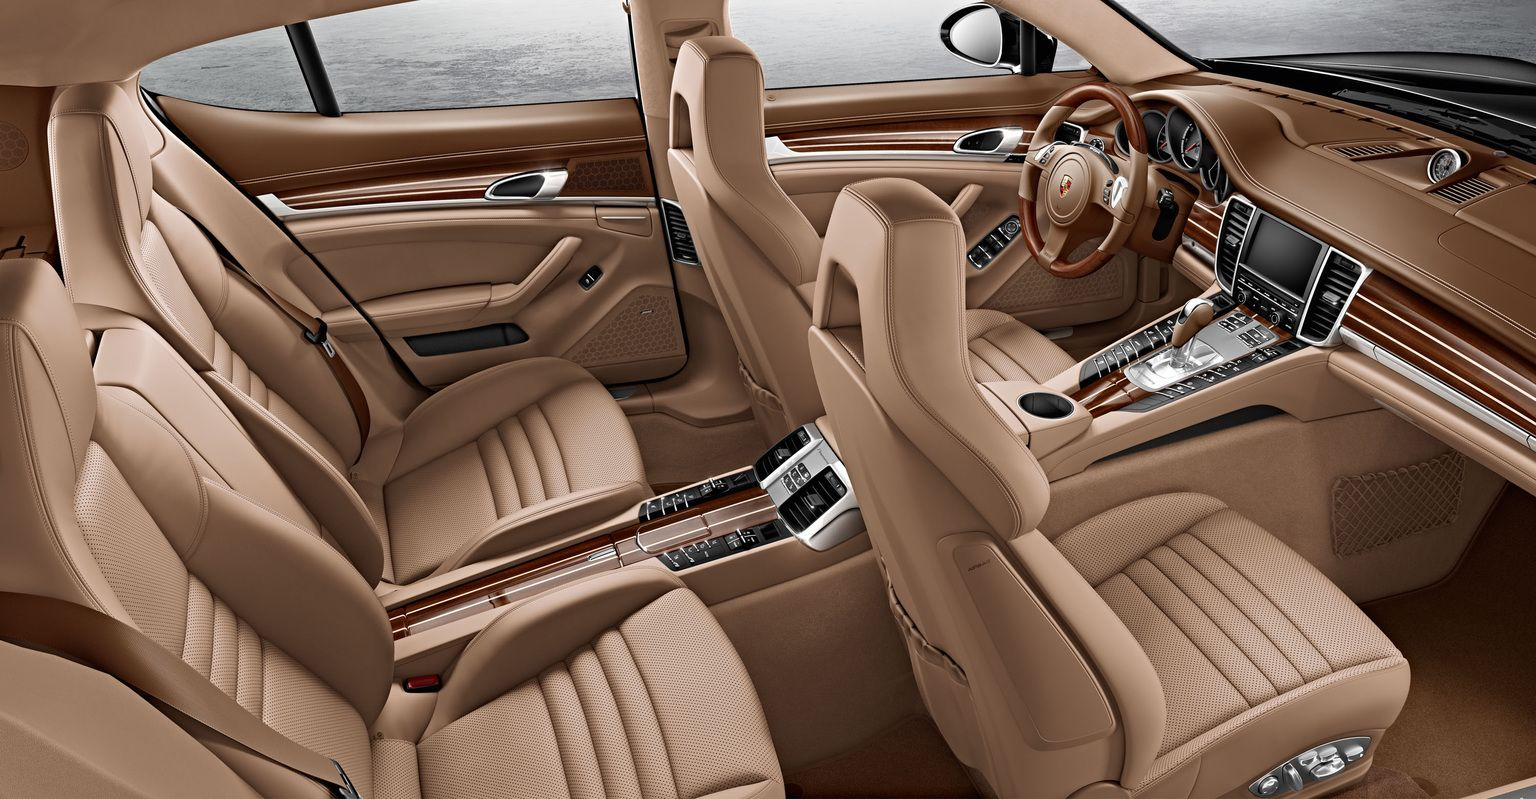 2014 porsche panamera interior car tuning - 2014 Porsche Panamera Turbo S Brown Interior